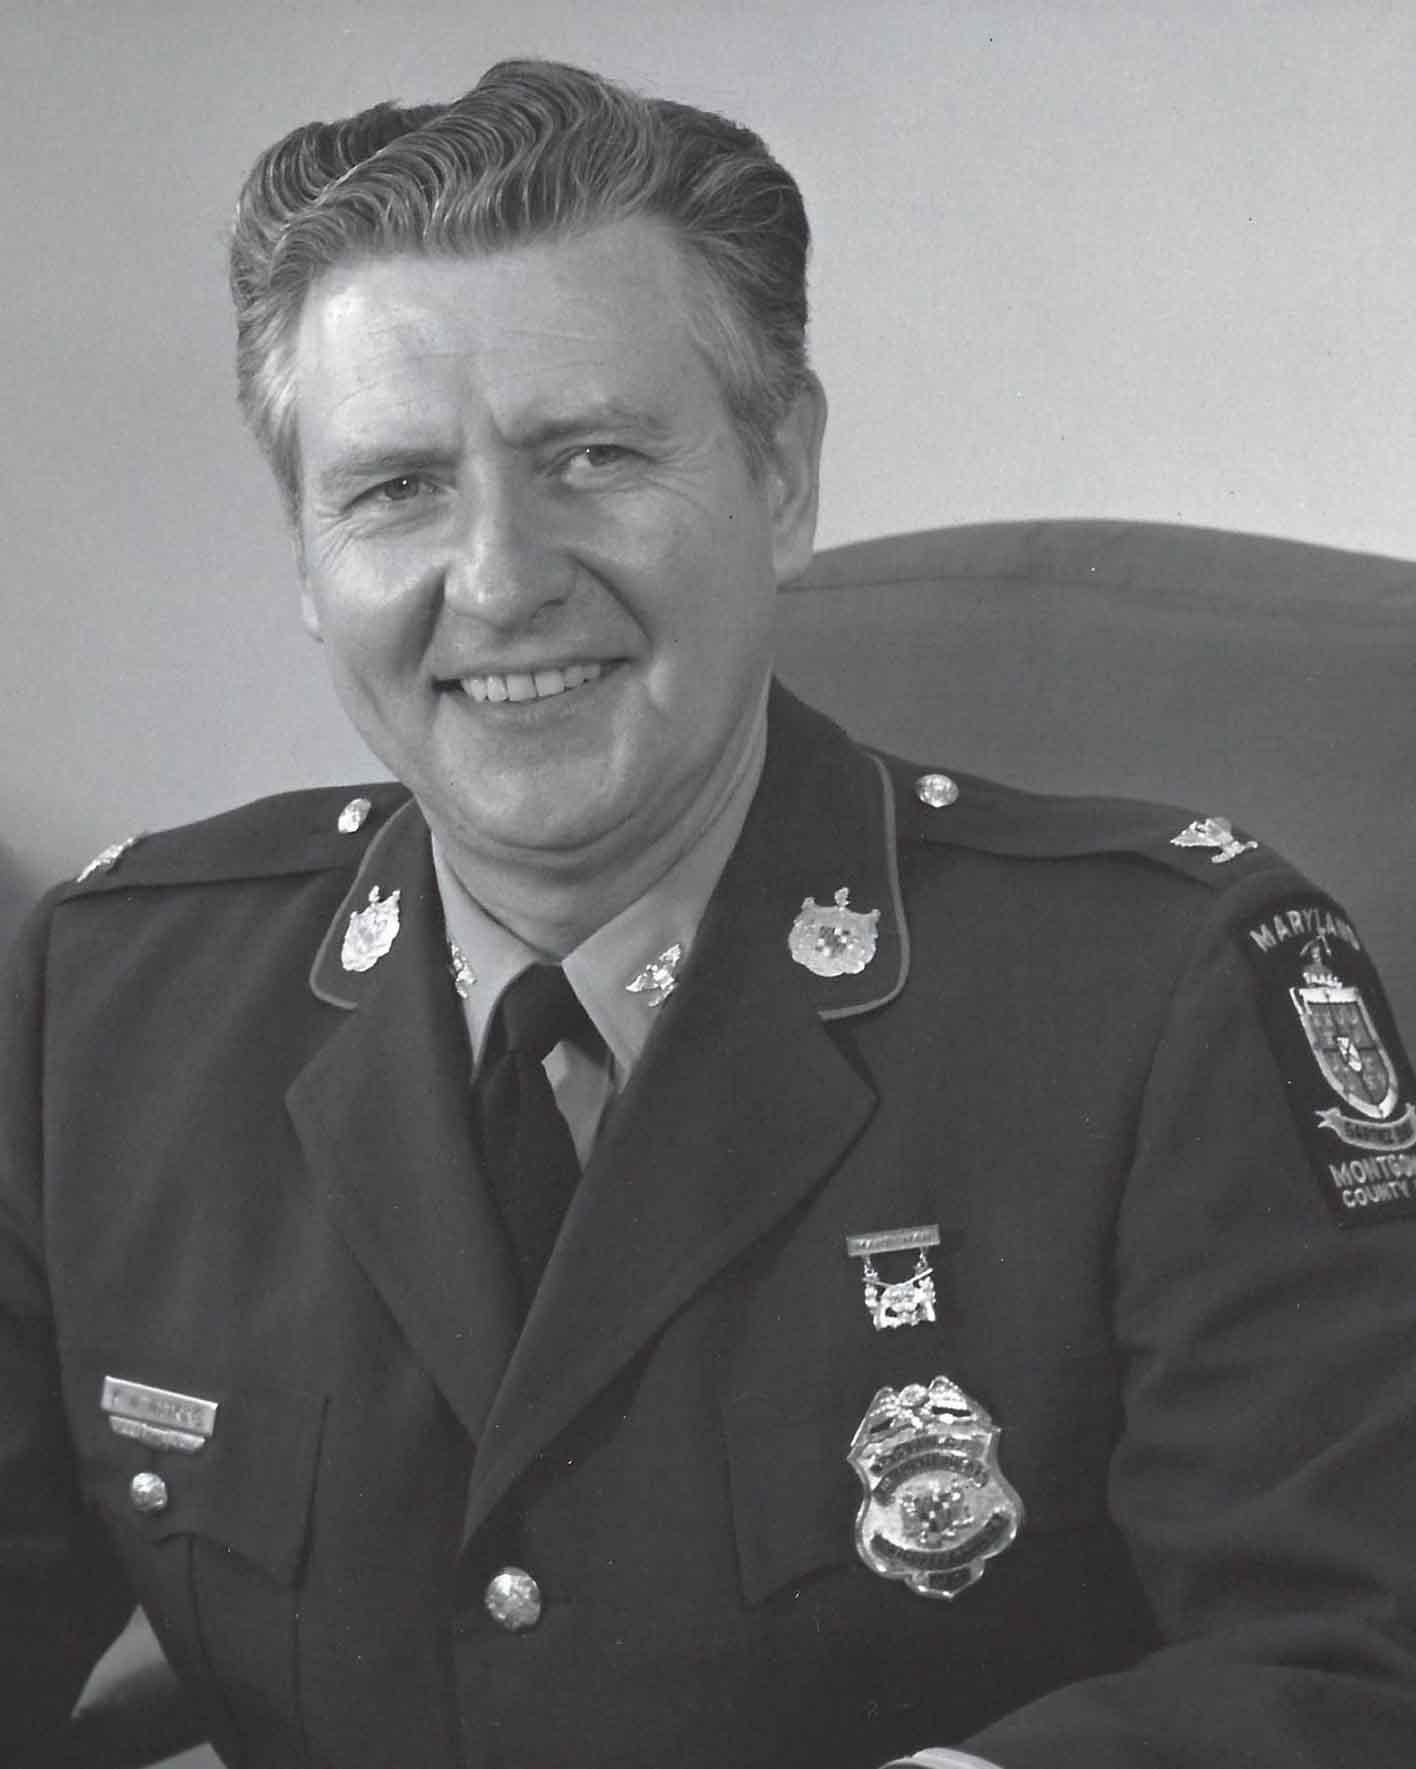 File:Colonel K  W  Watkins - Montgomery County Police